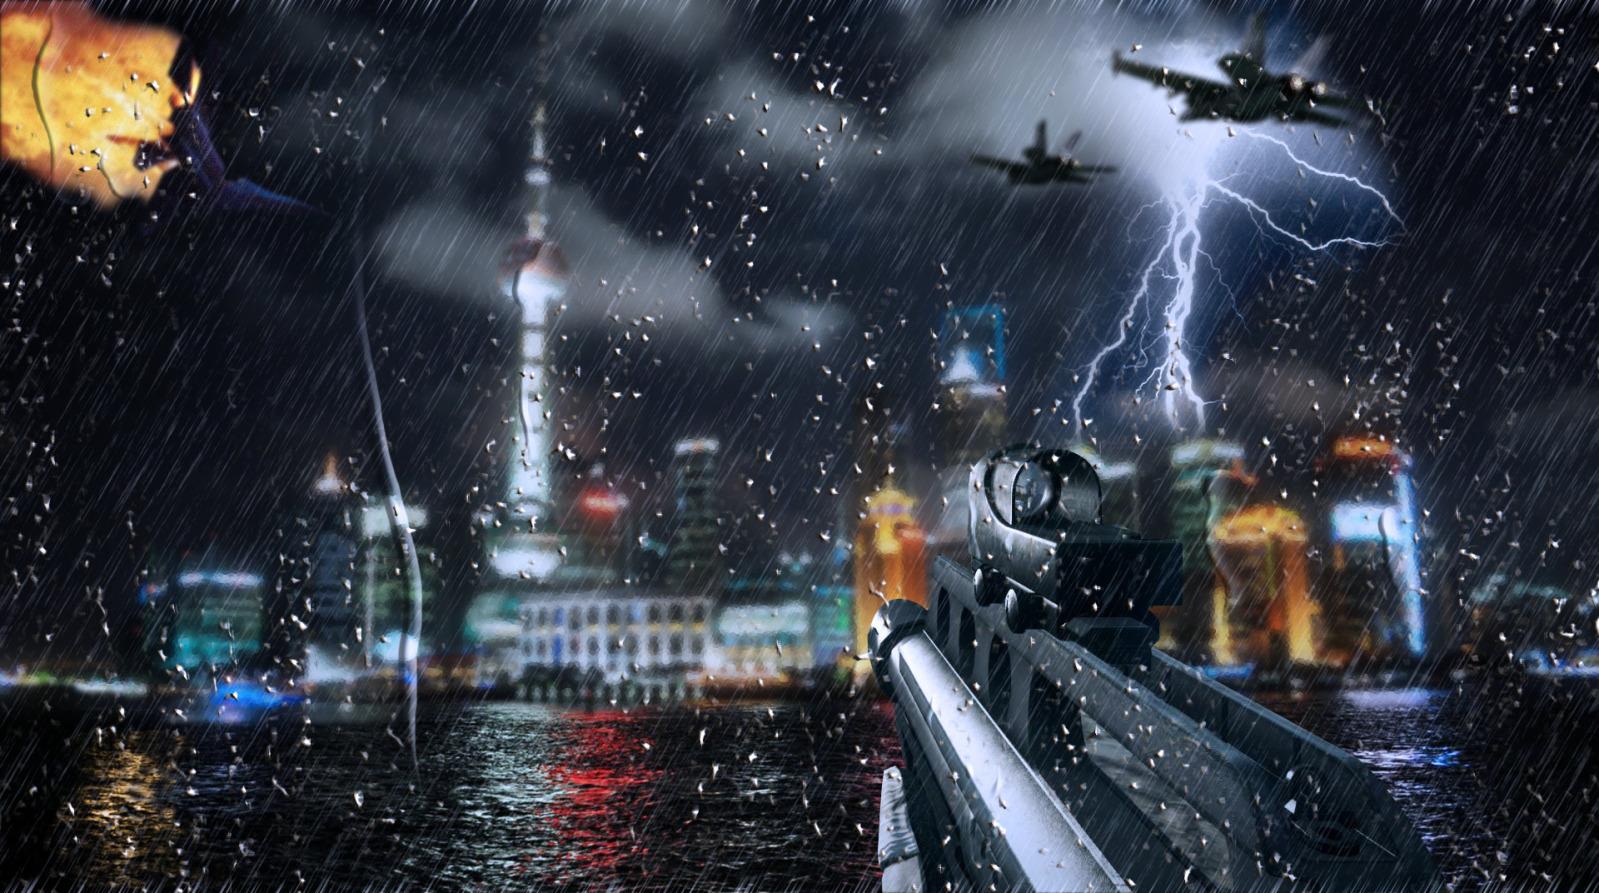 Battlefield 4 Night Sky